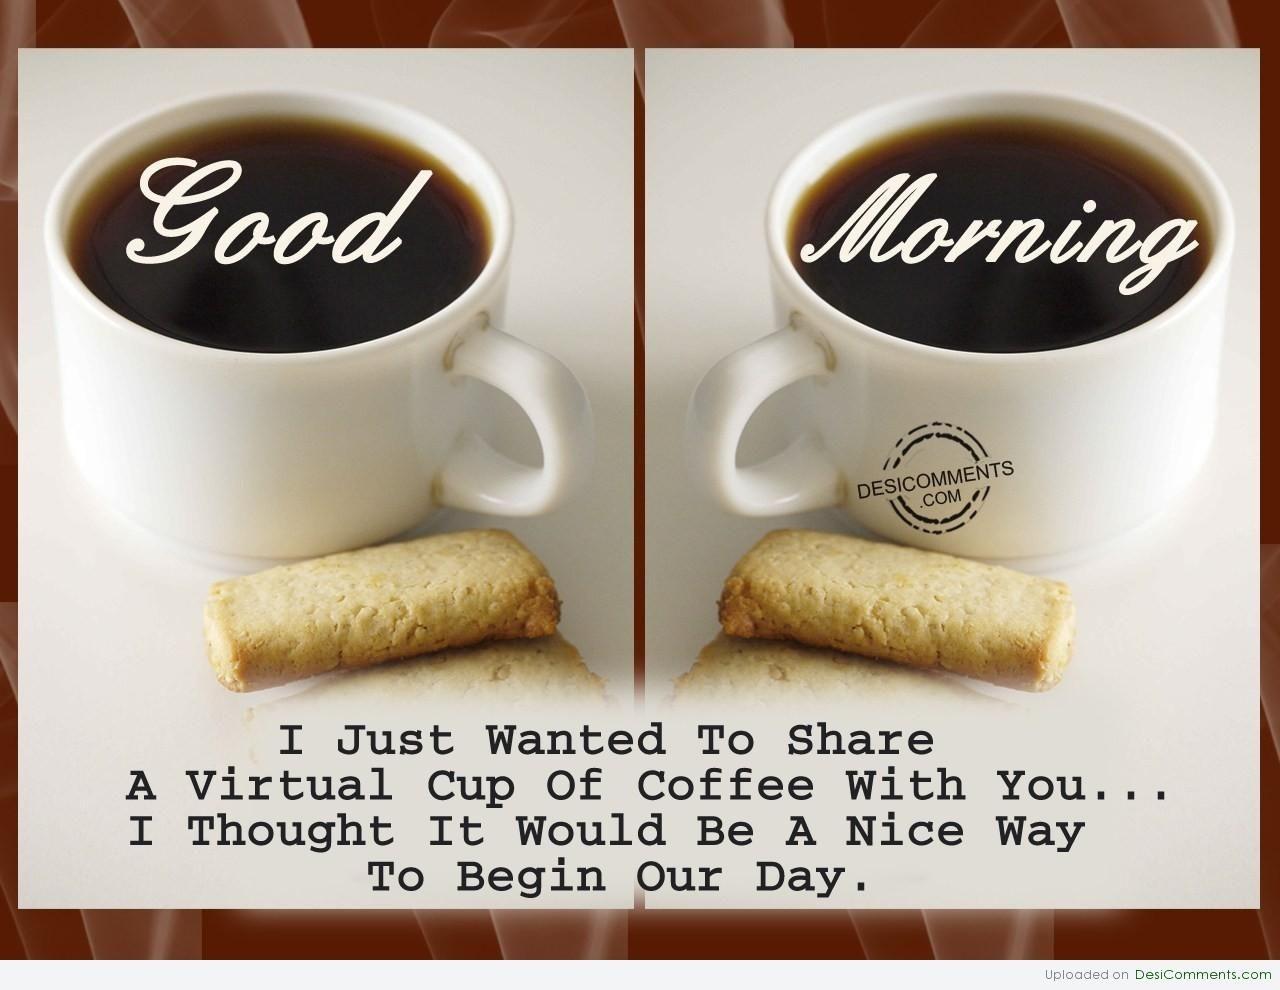 Hump Day Coffee Memes - | Tartan | Good morning, Good morning ... #goodMorningCoffee